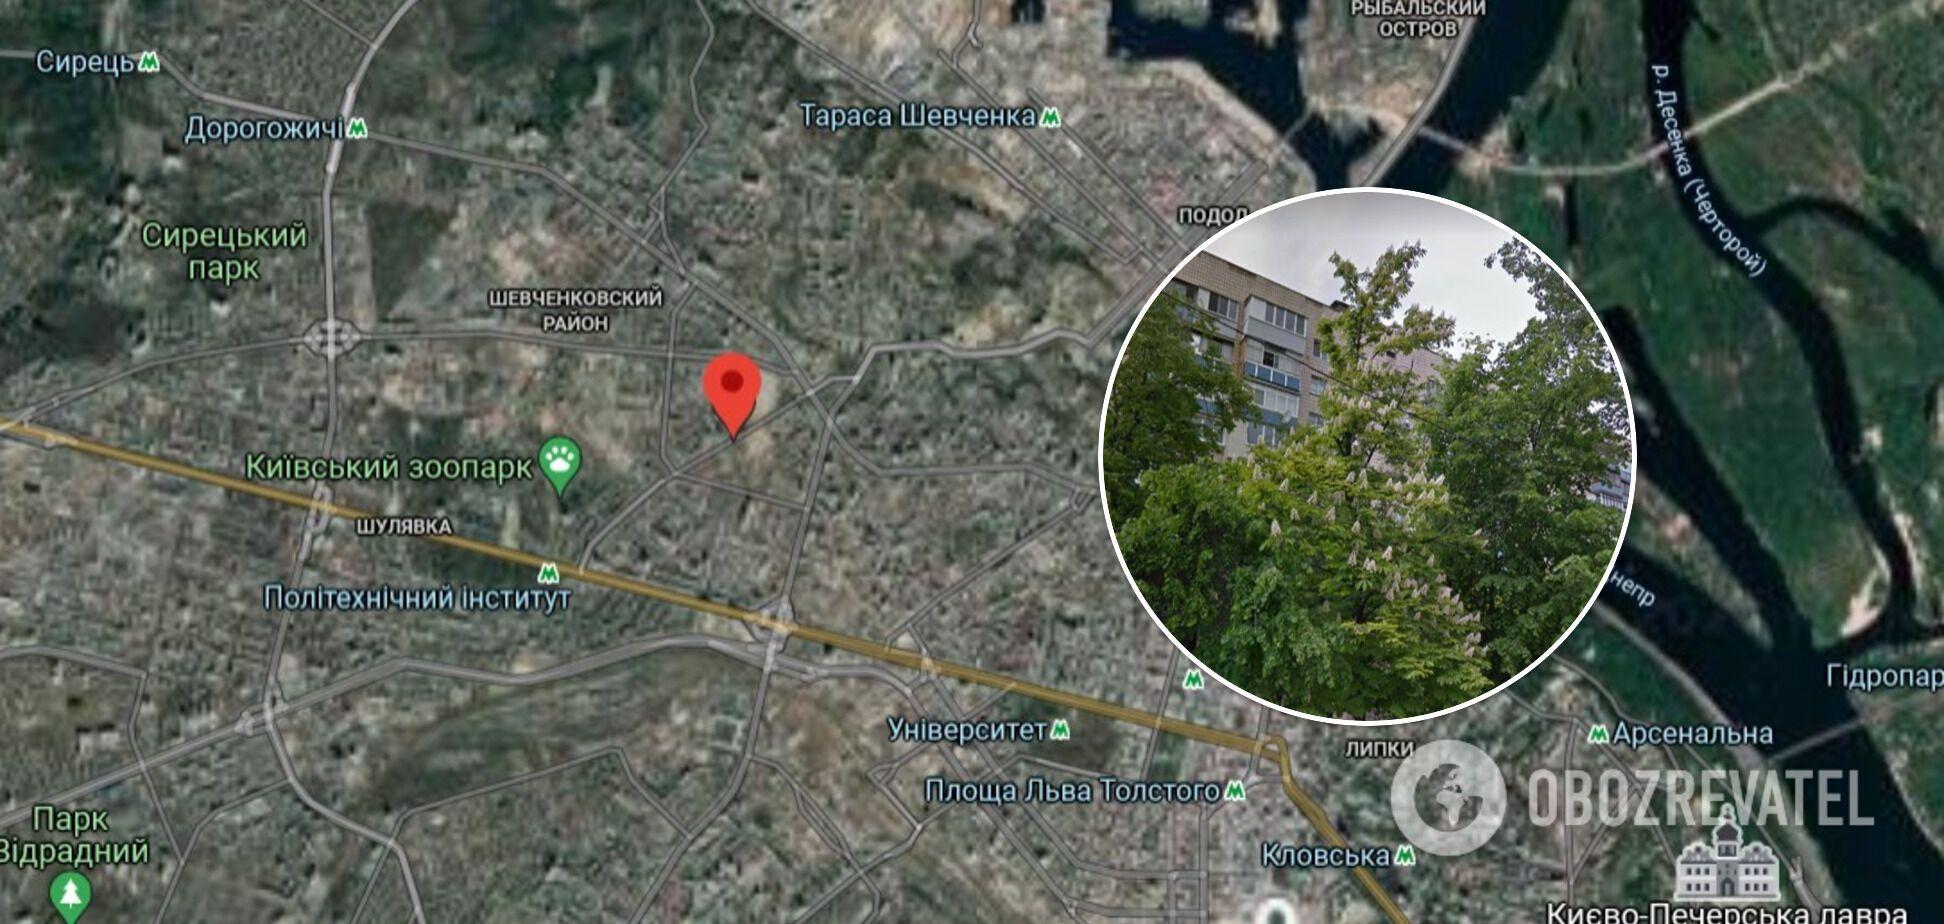 Дом, где произошла кража, находится на улице Коперника